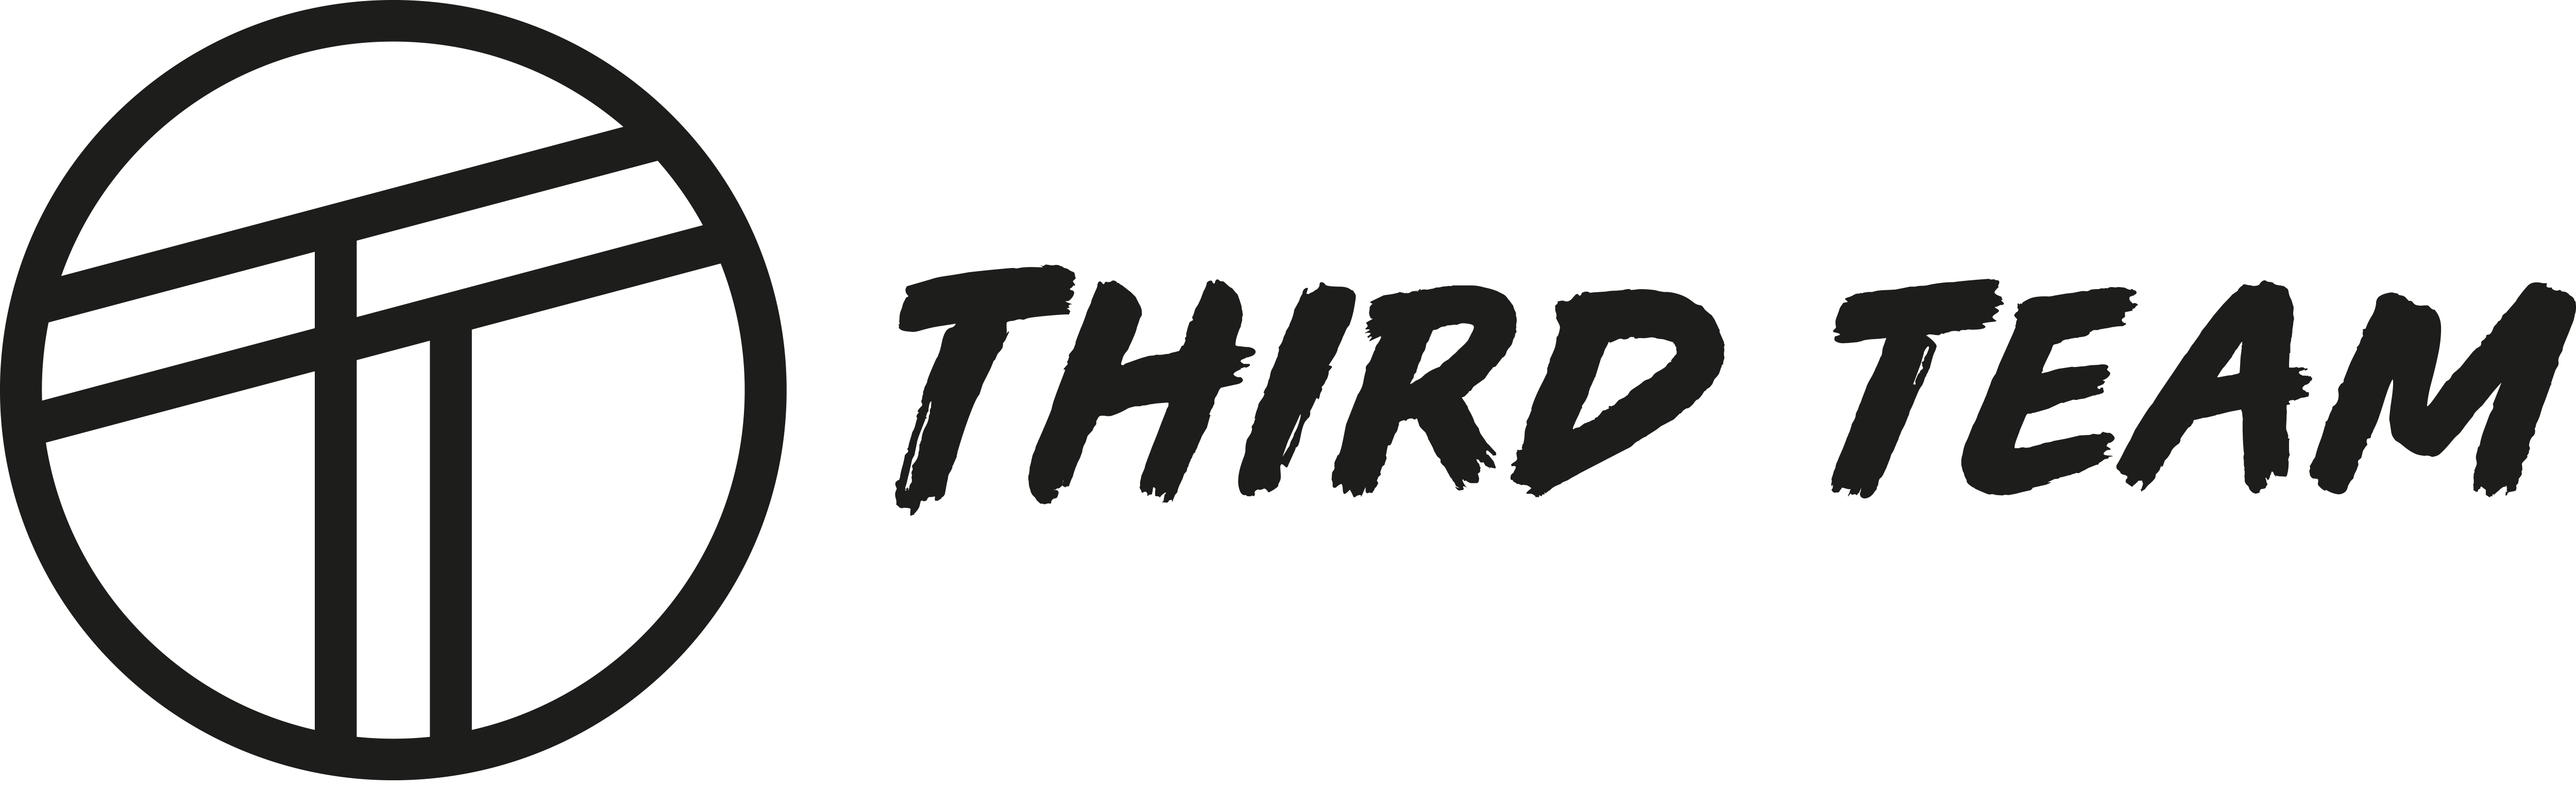 shop.thirdteam.de